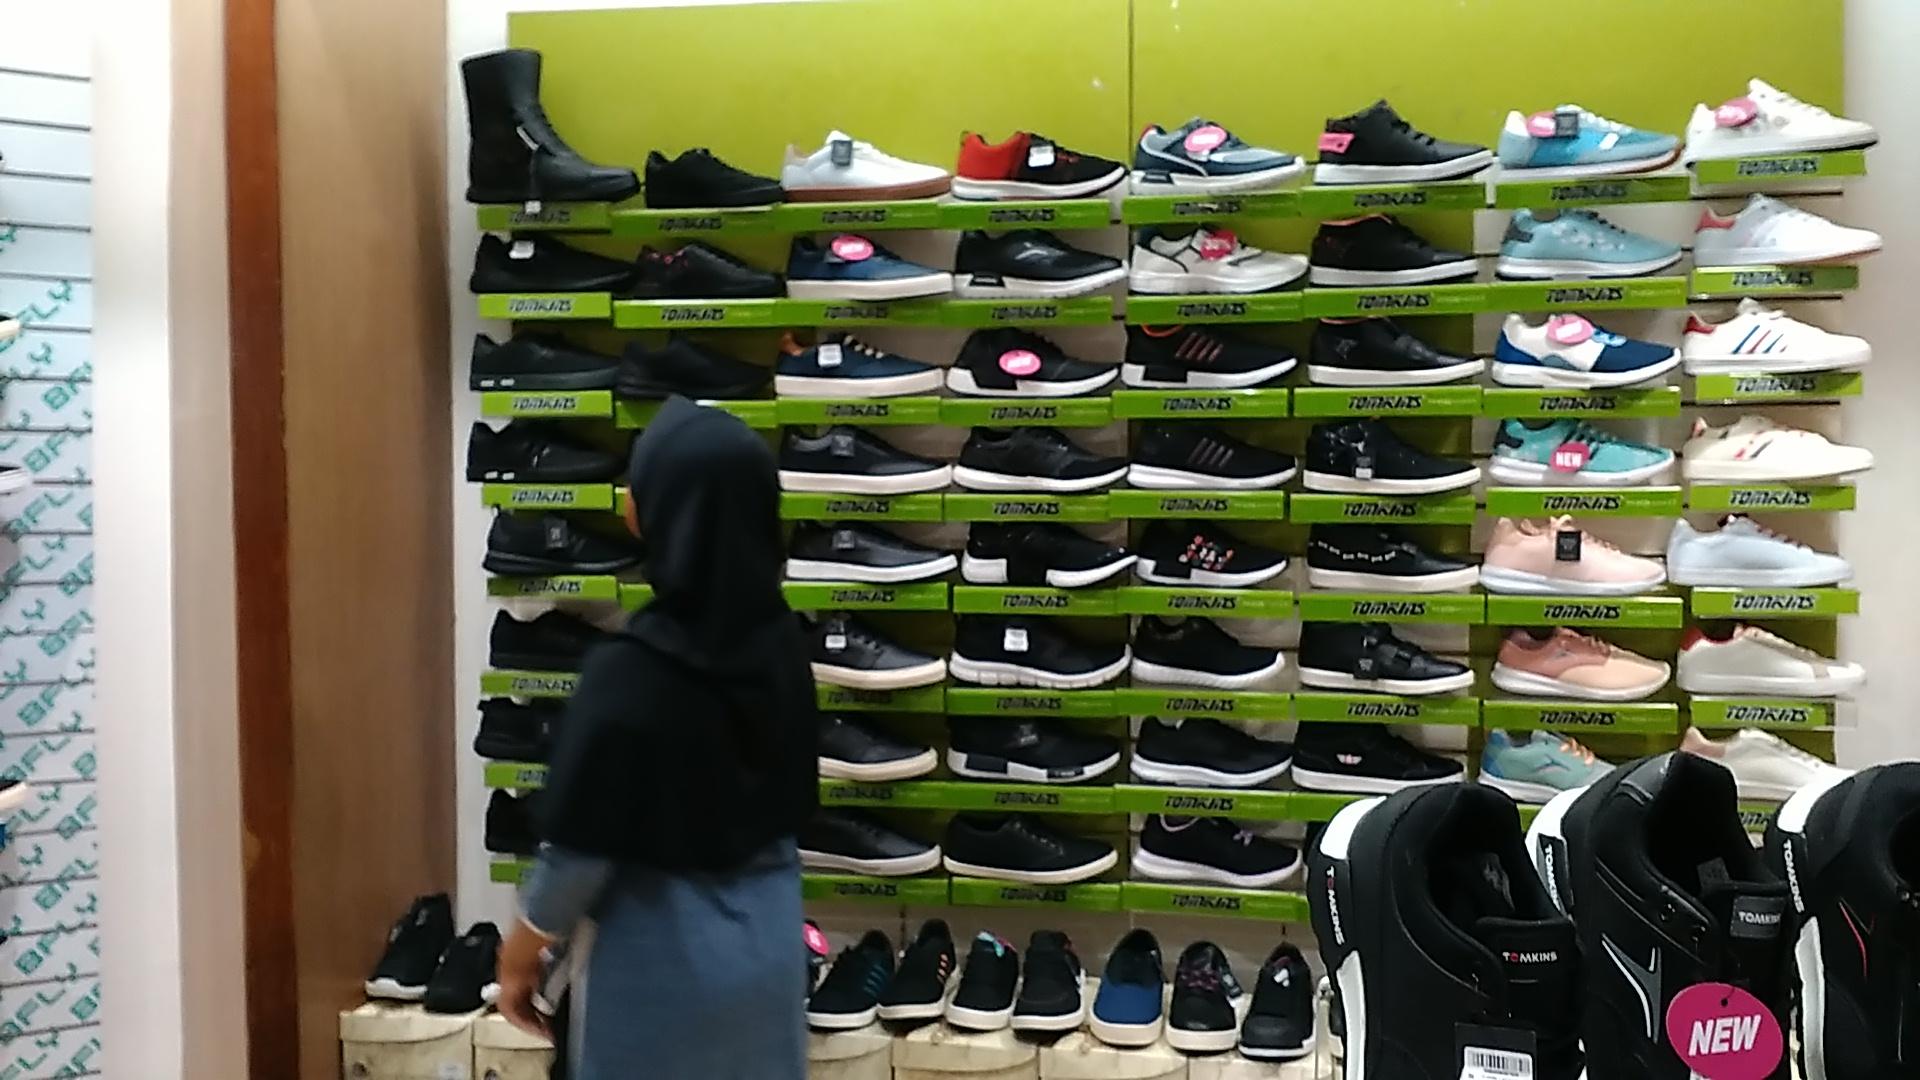 Akhirnya, Membeli Sepatu Baru